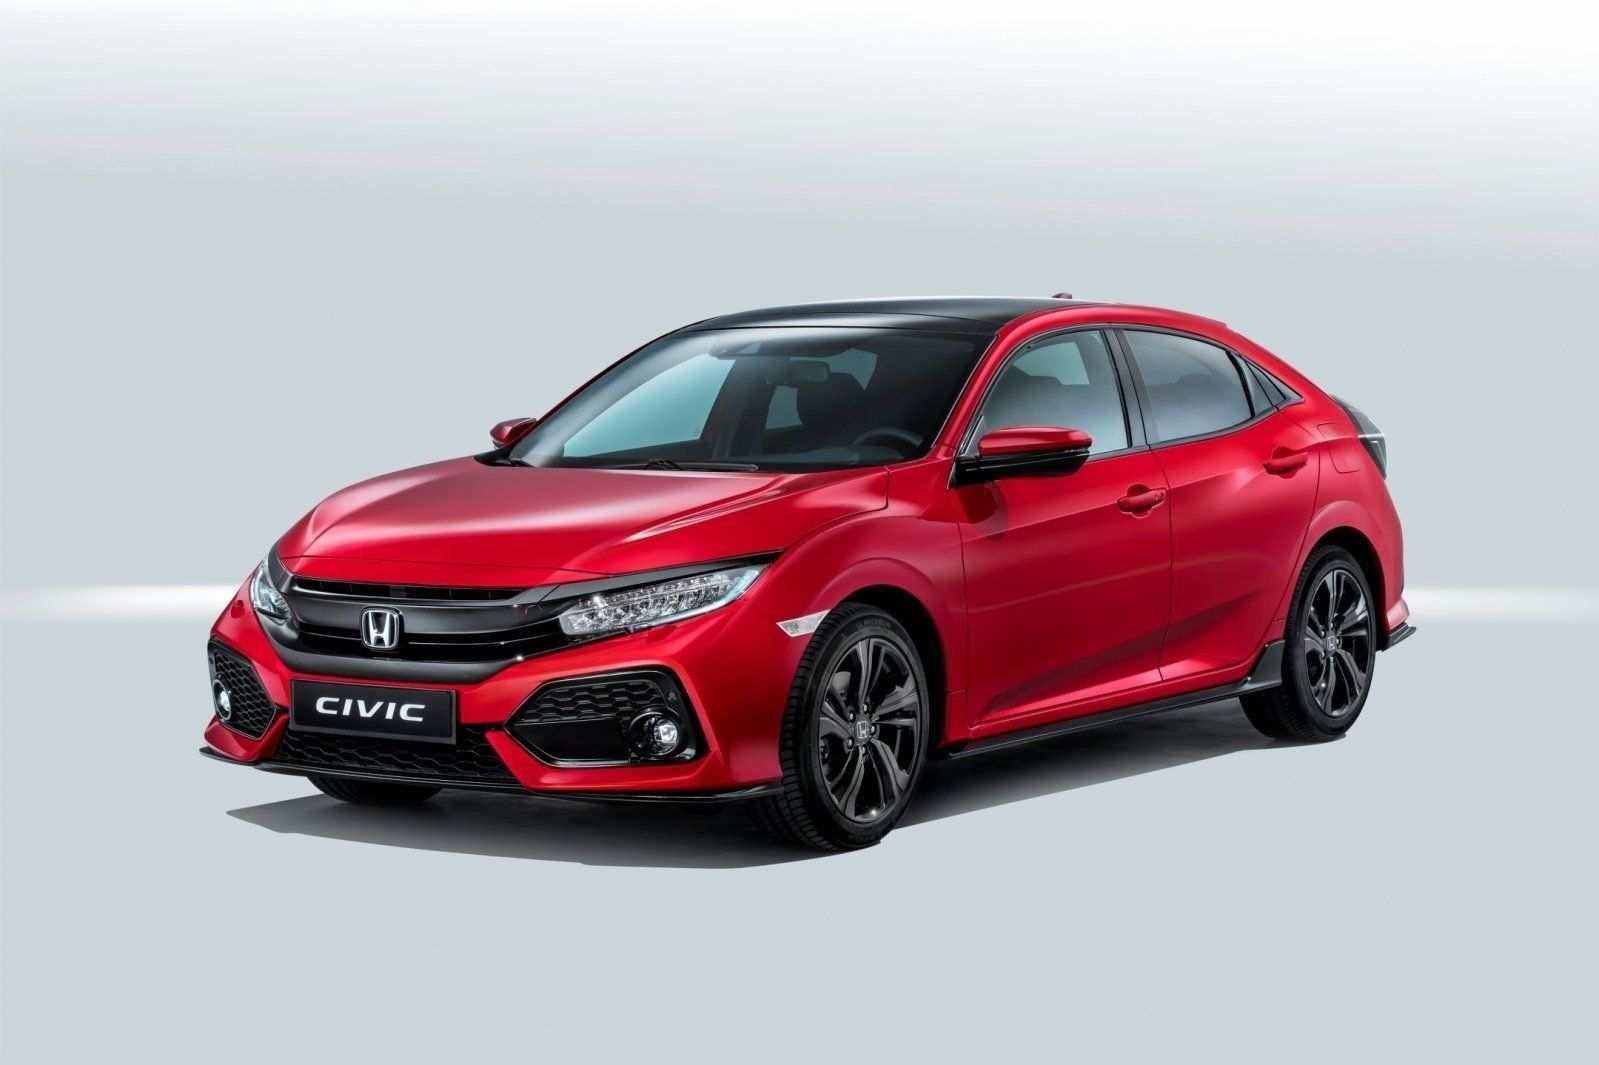 21 All New Honda Civic Kombi 2020 Concept with Honda Civic Kombi 2020